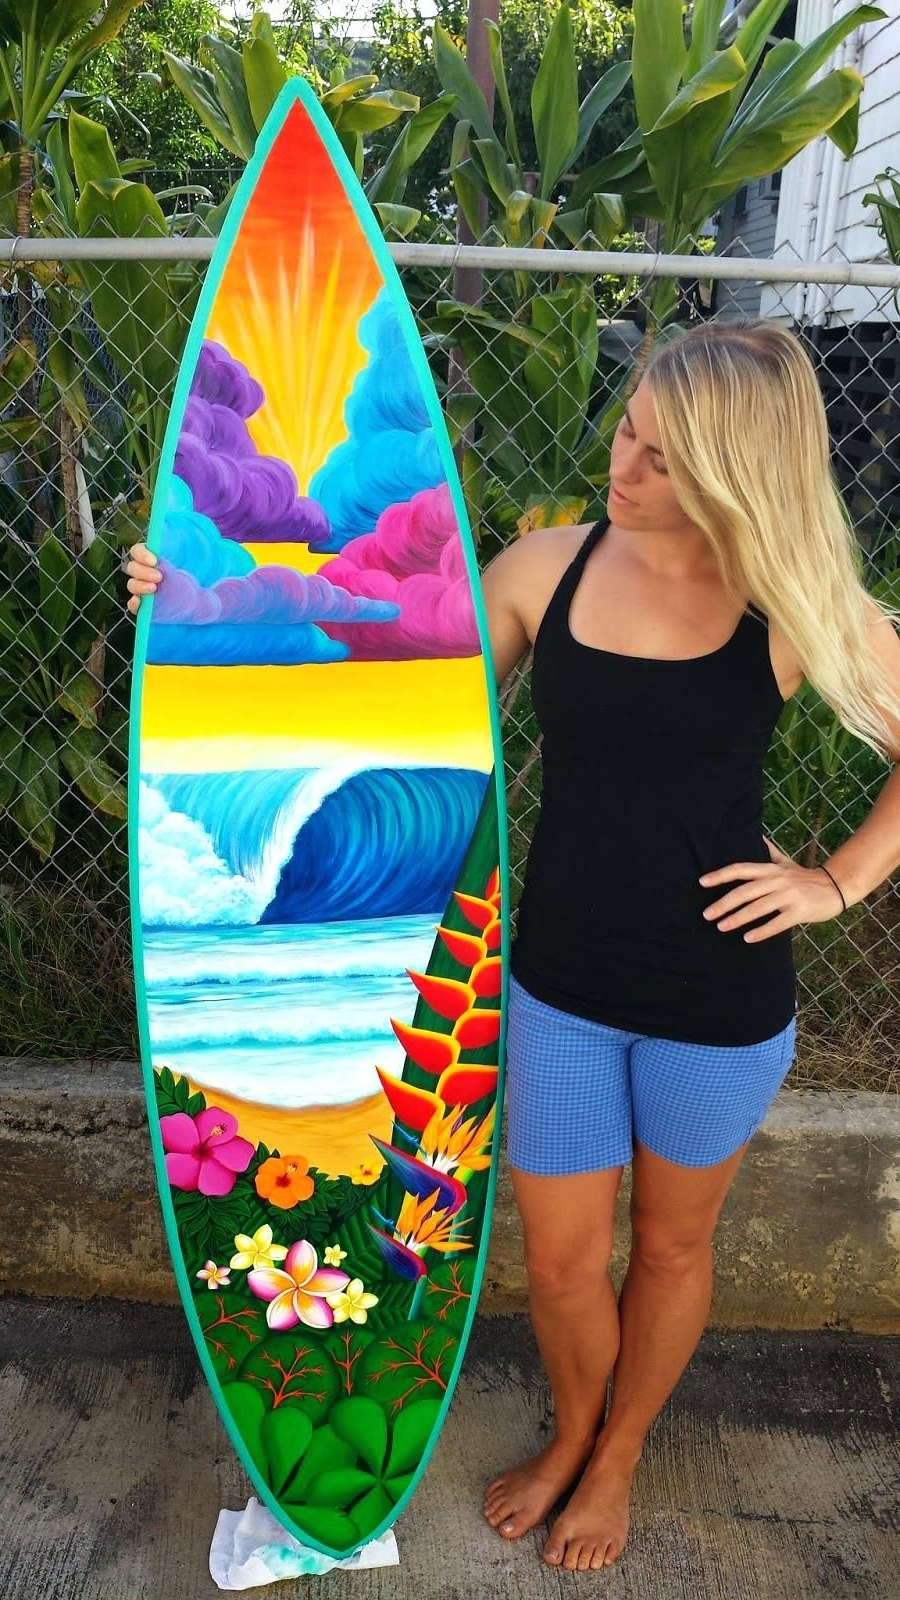 Hazlo Tú Regarding Surfboard Wall Art (View 2 of 15)